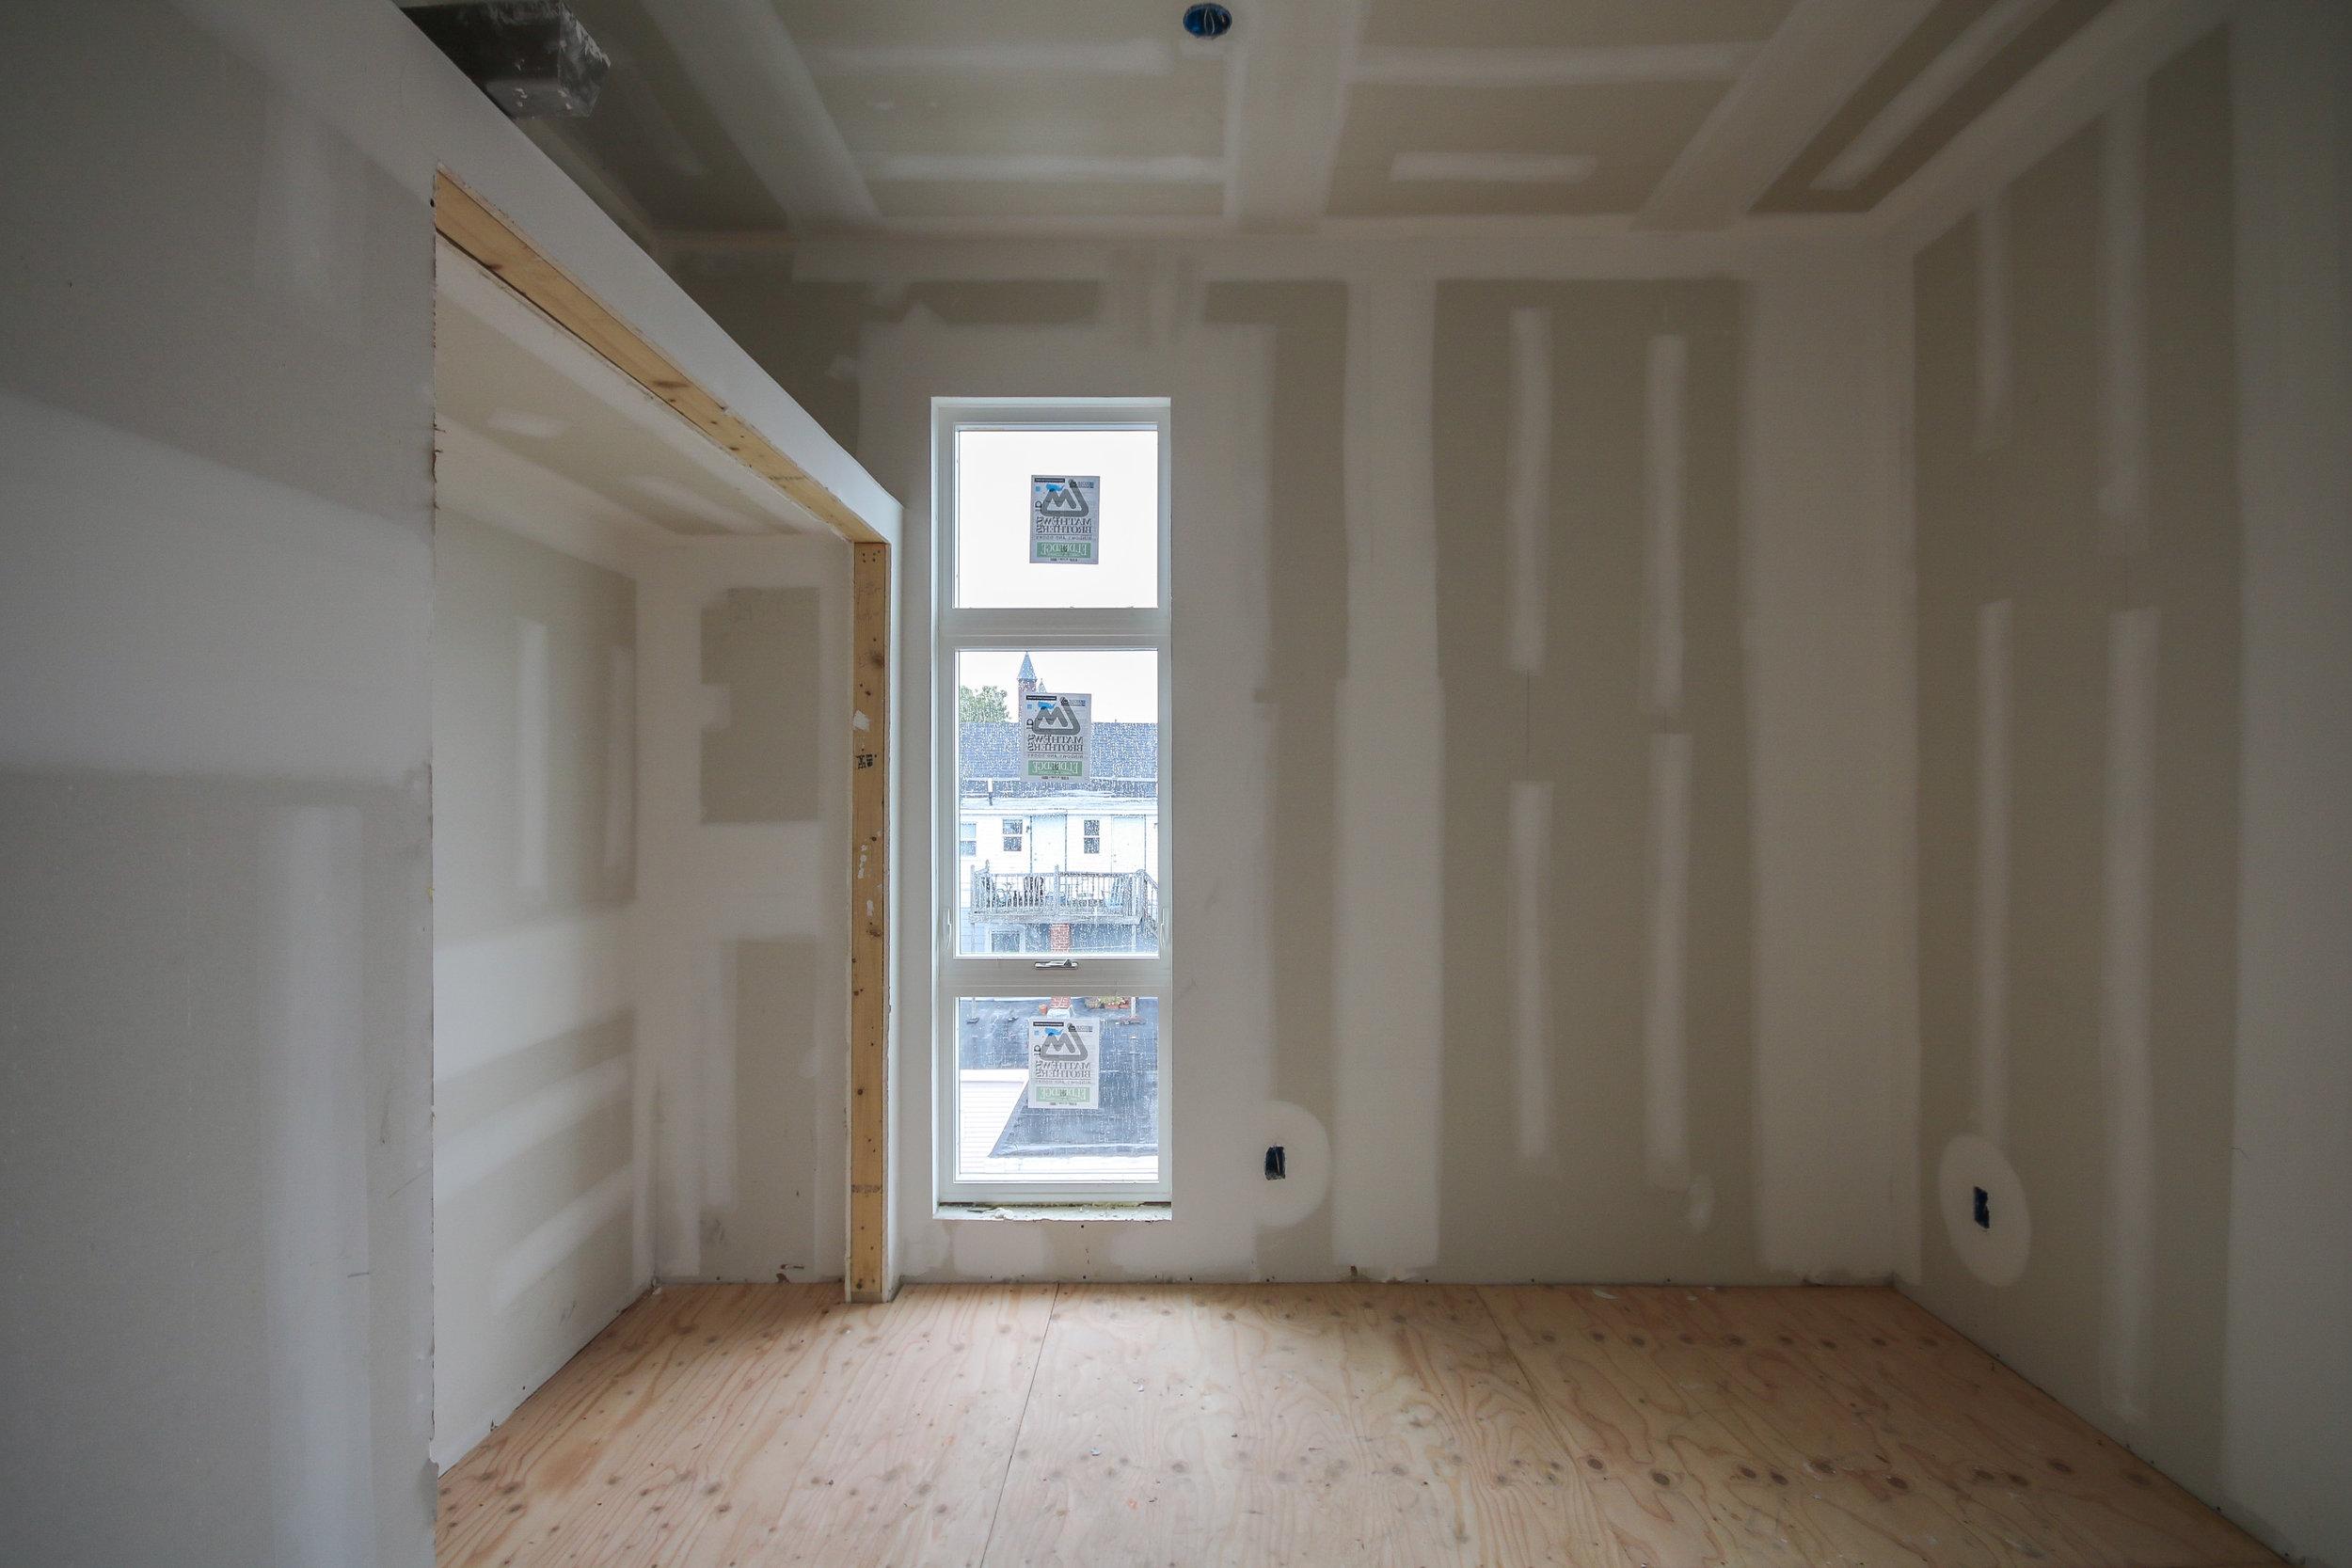 Interior Construction Update - 9/27/18